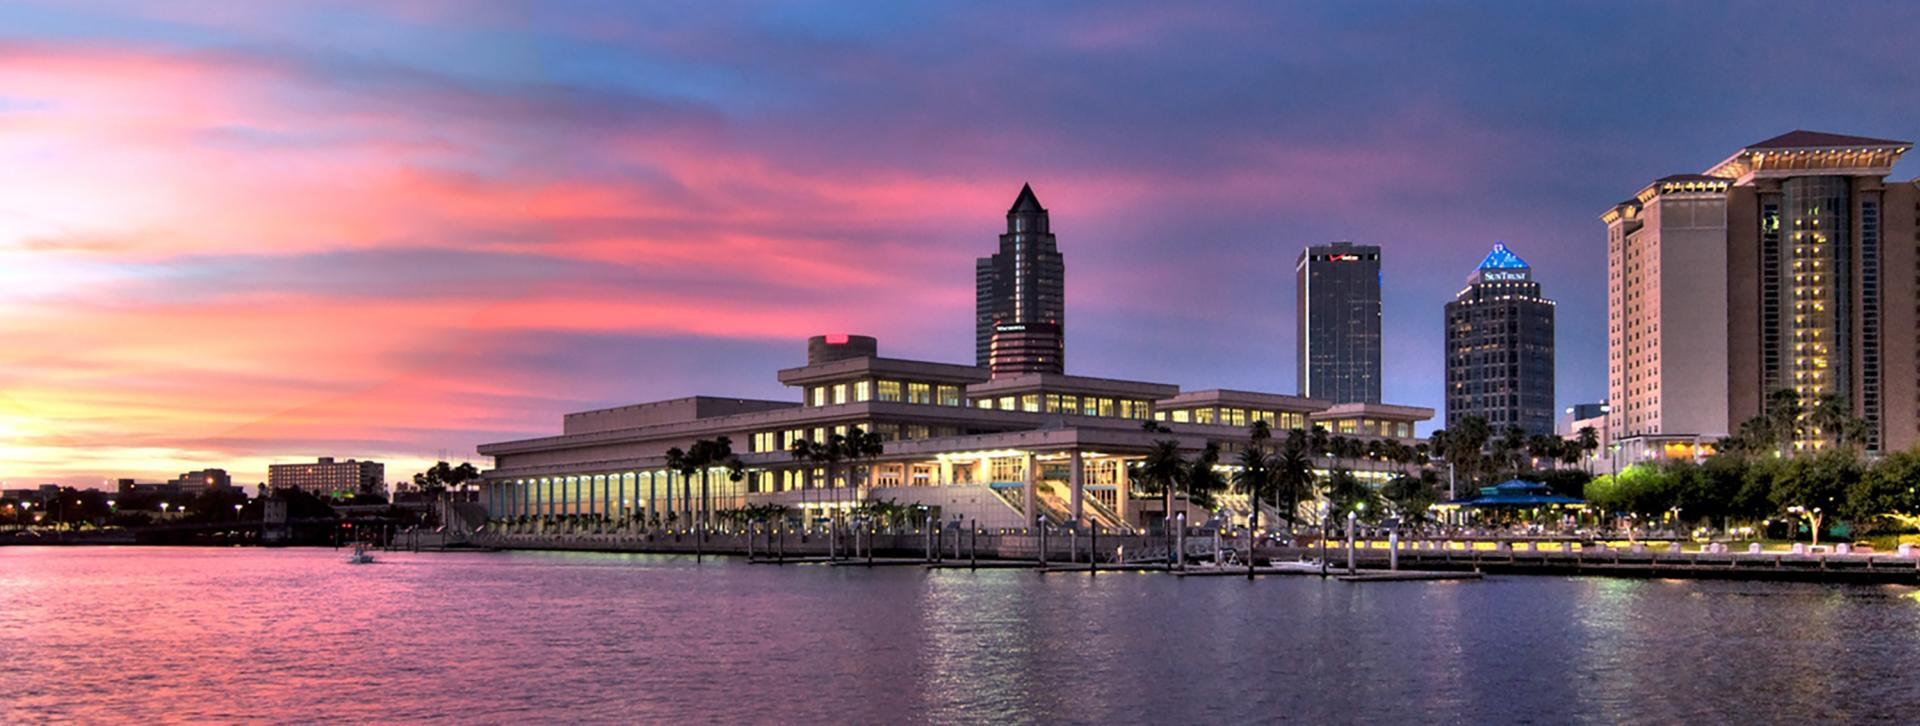 Hotels In Tampa Visit Tampa Bay